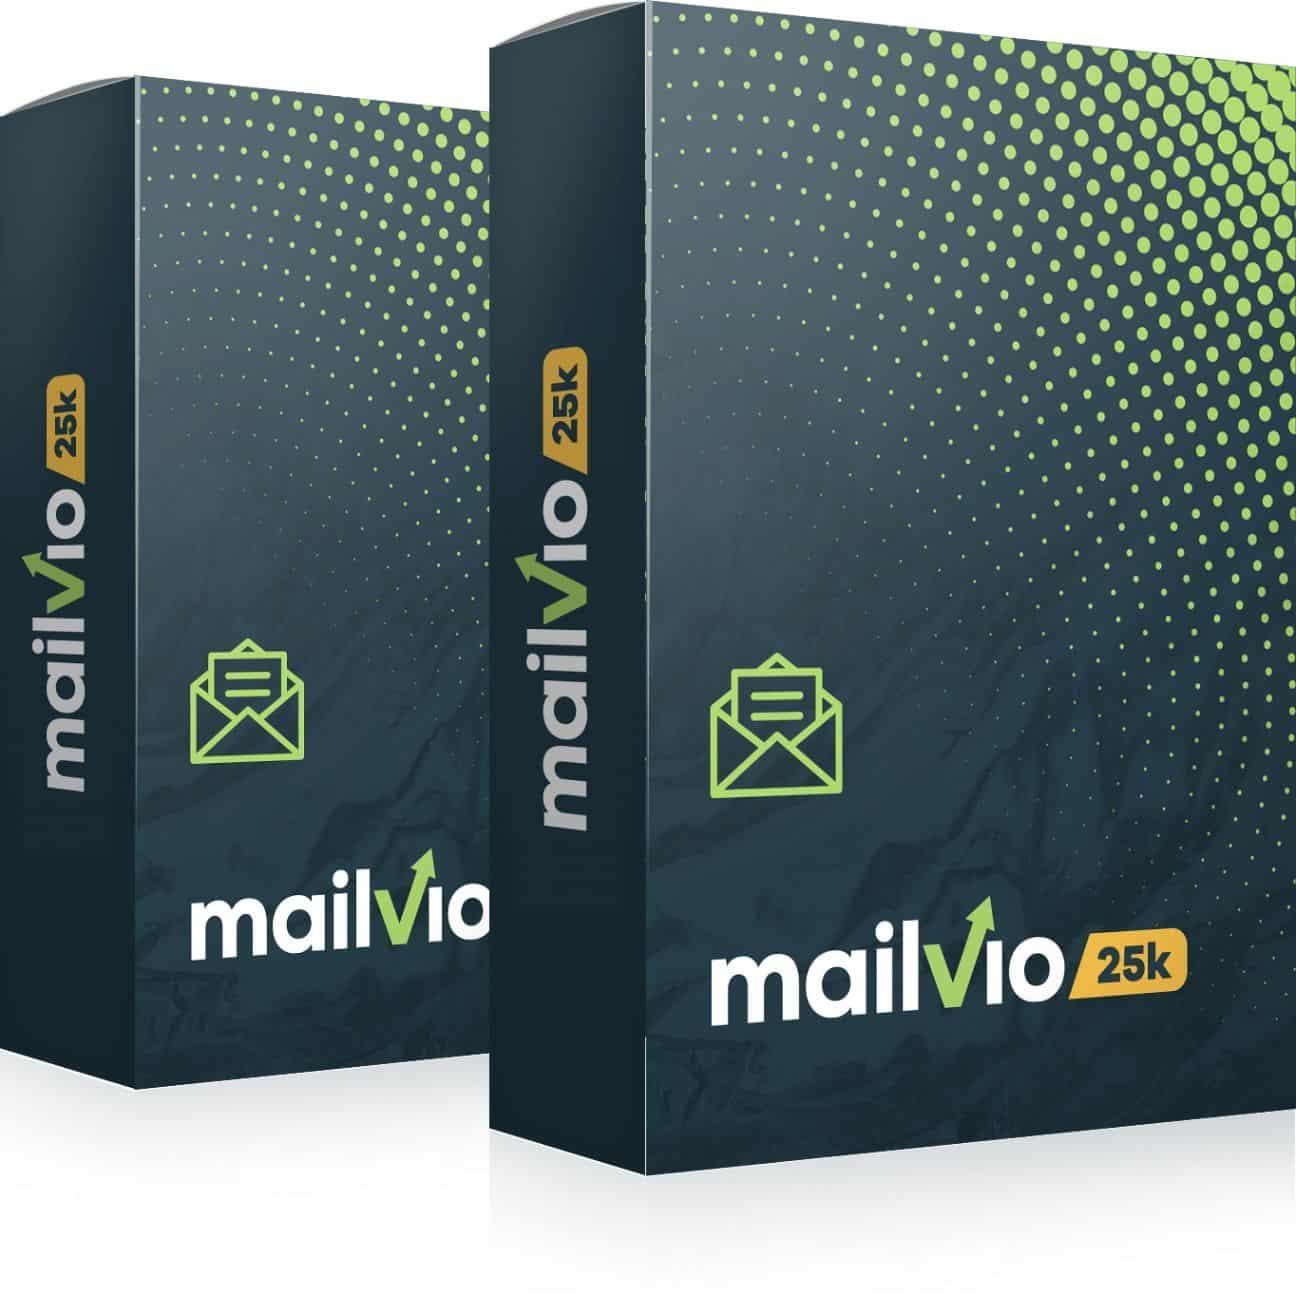 MailVio Review And Bonus